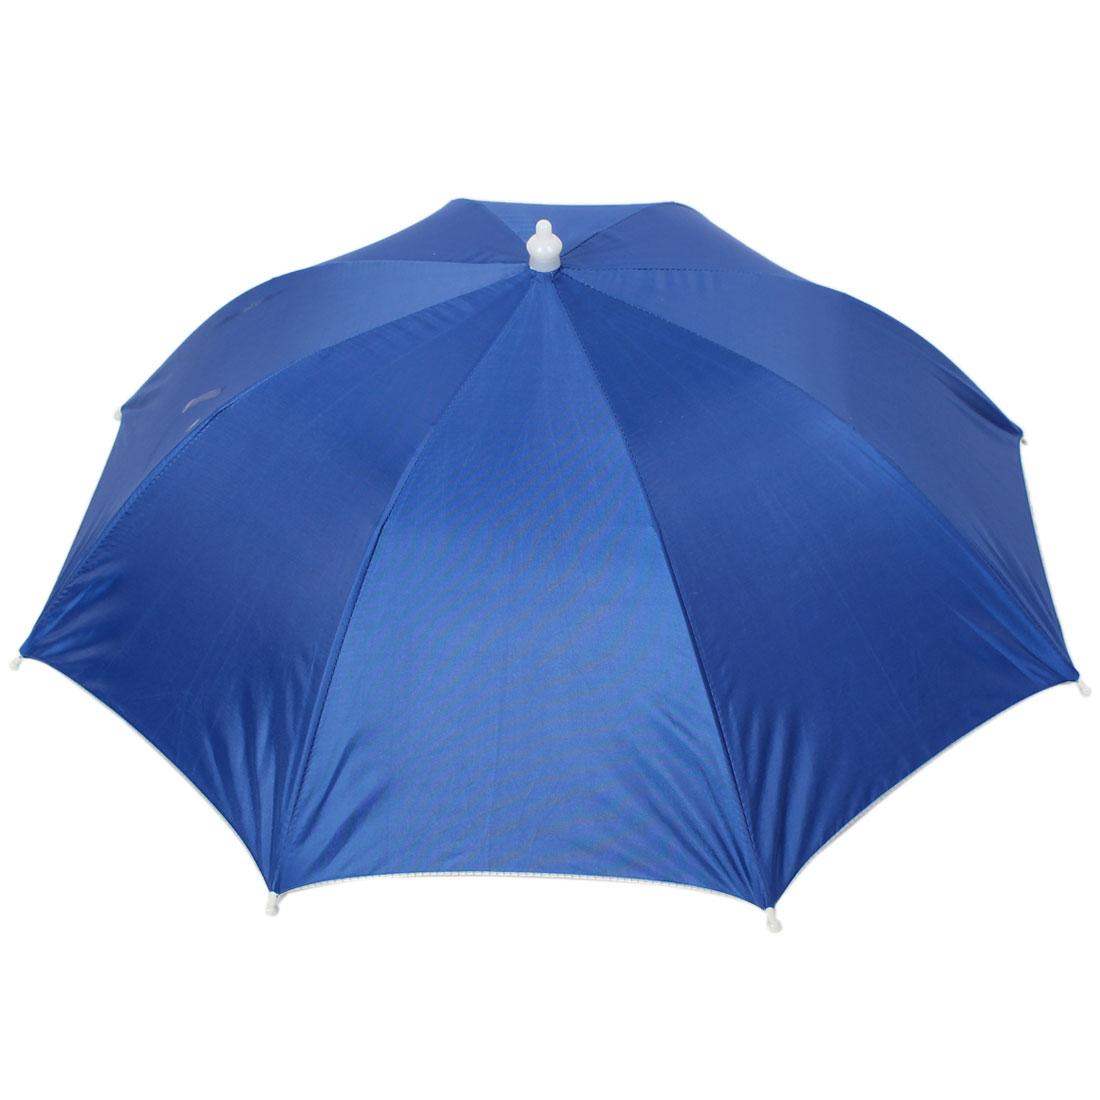 Outdoor Headwear Elastic Headband Foldable Umbrella Hat Dark Blue